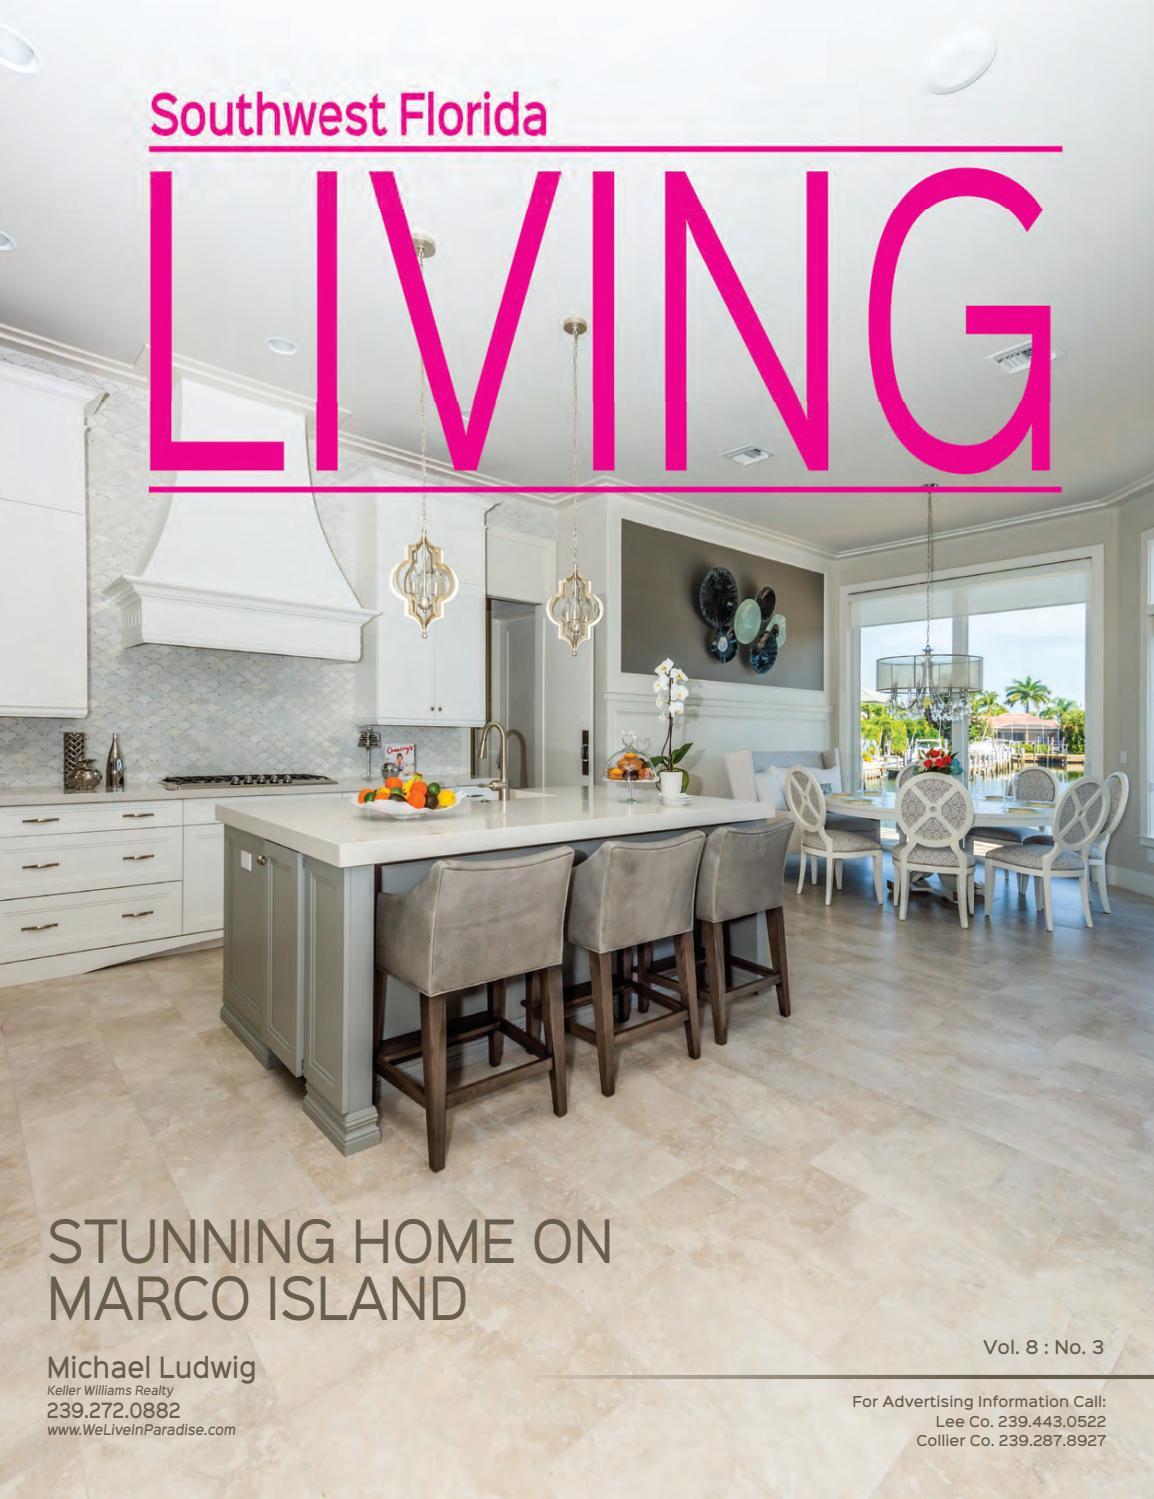 Southwest Florida LIVING - 8_3 by Real Estate Showcase Inc. - issuu